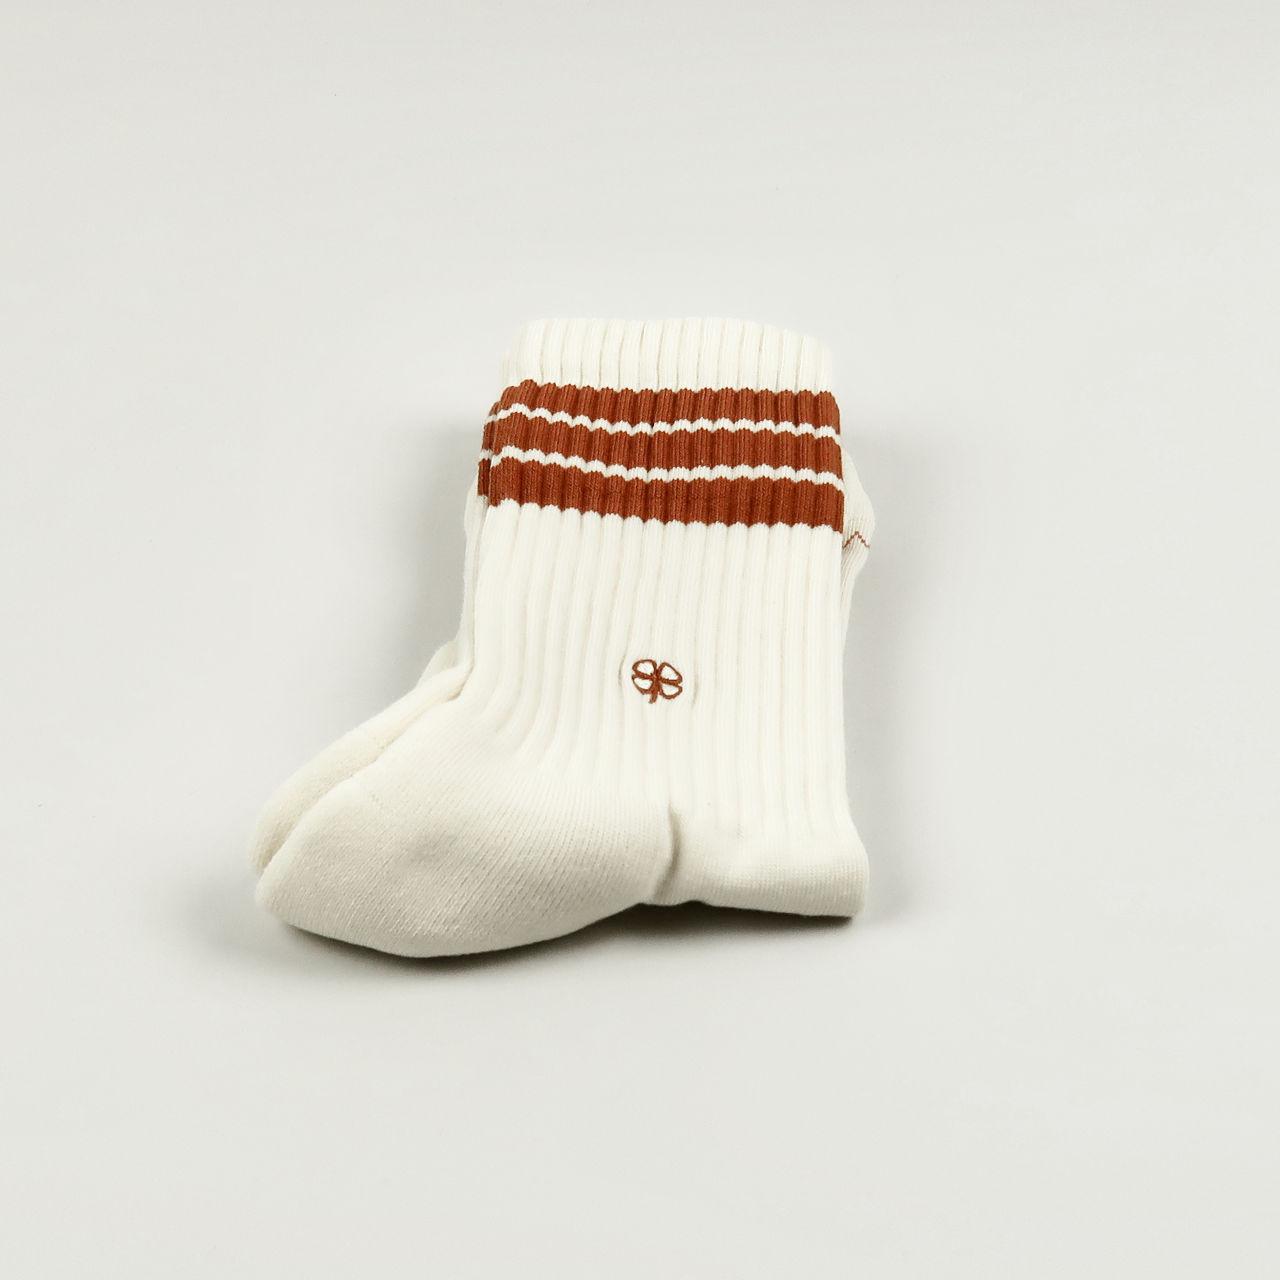 Men's Socks - Old School Clay